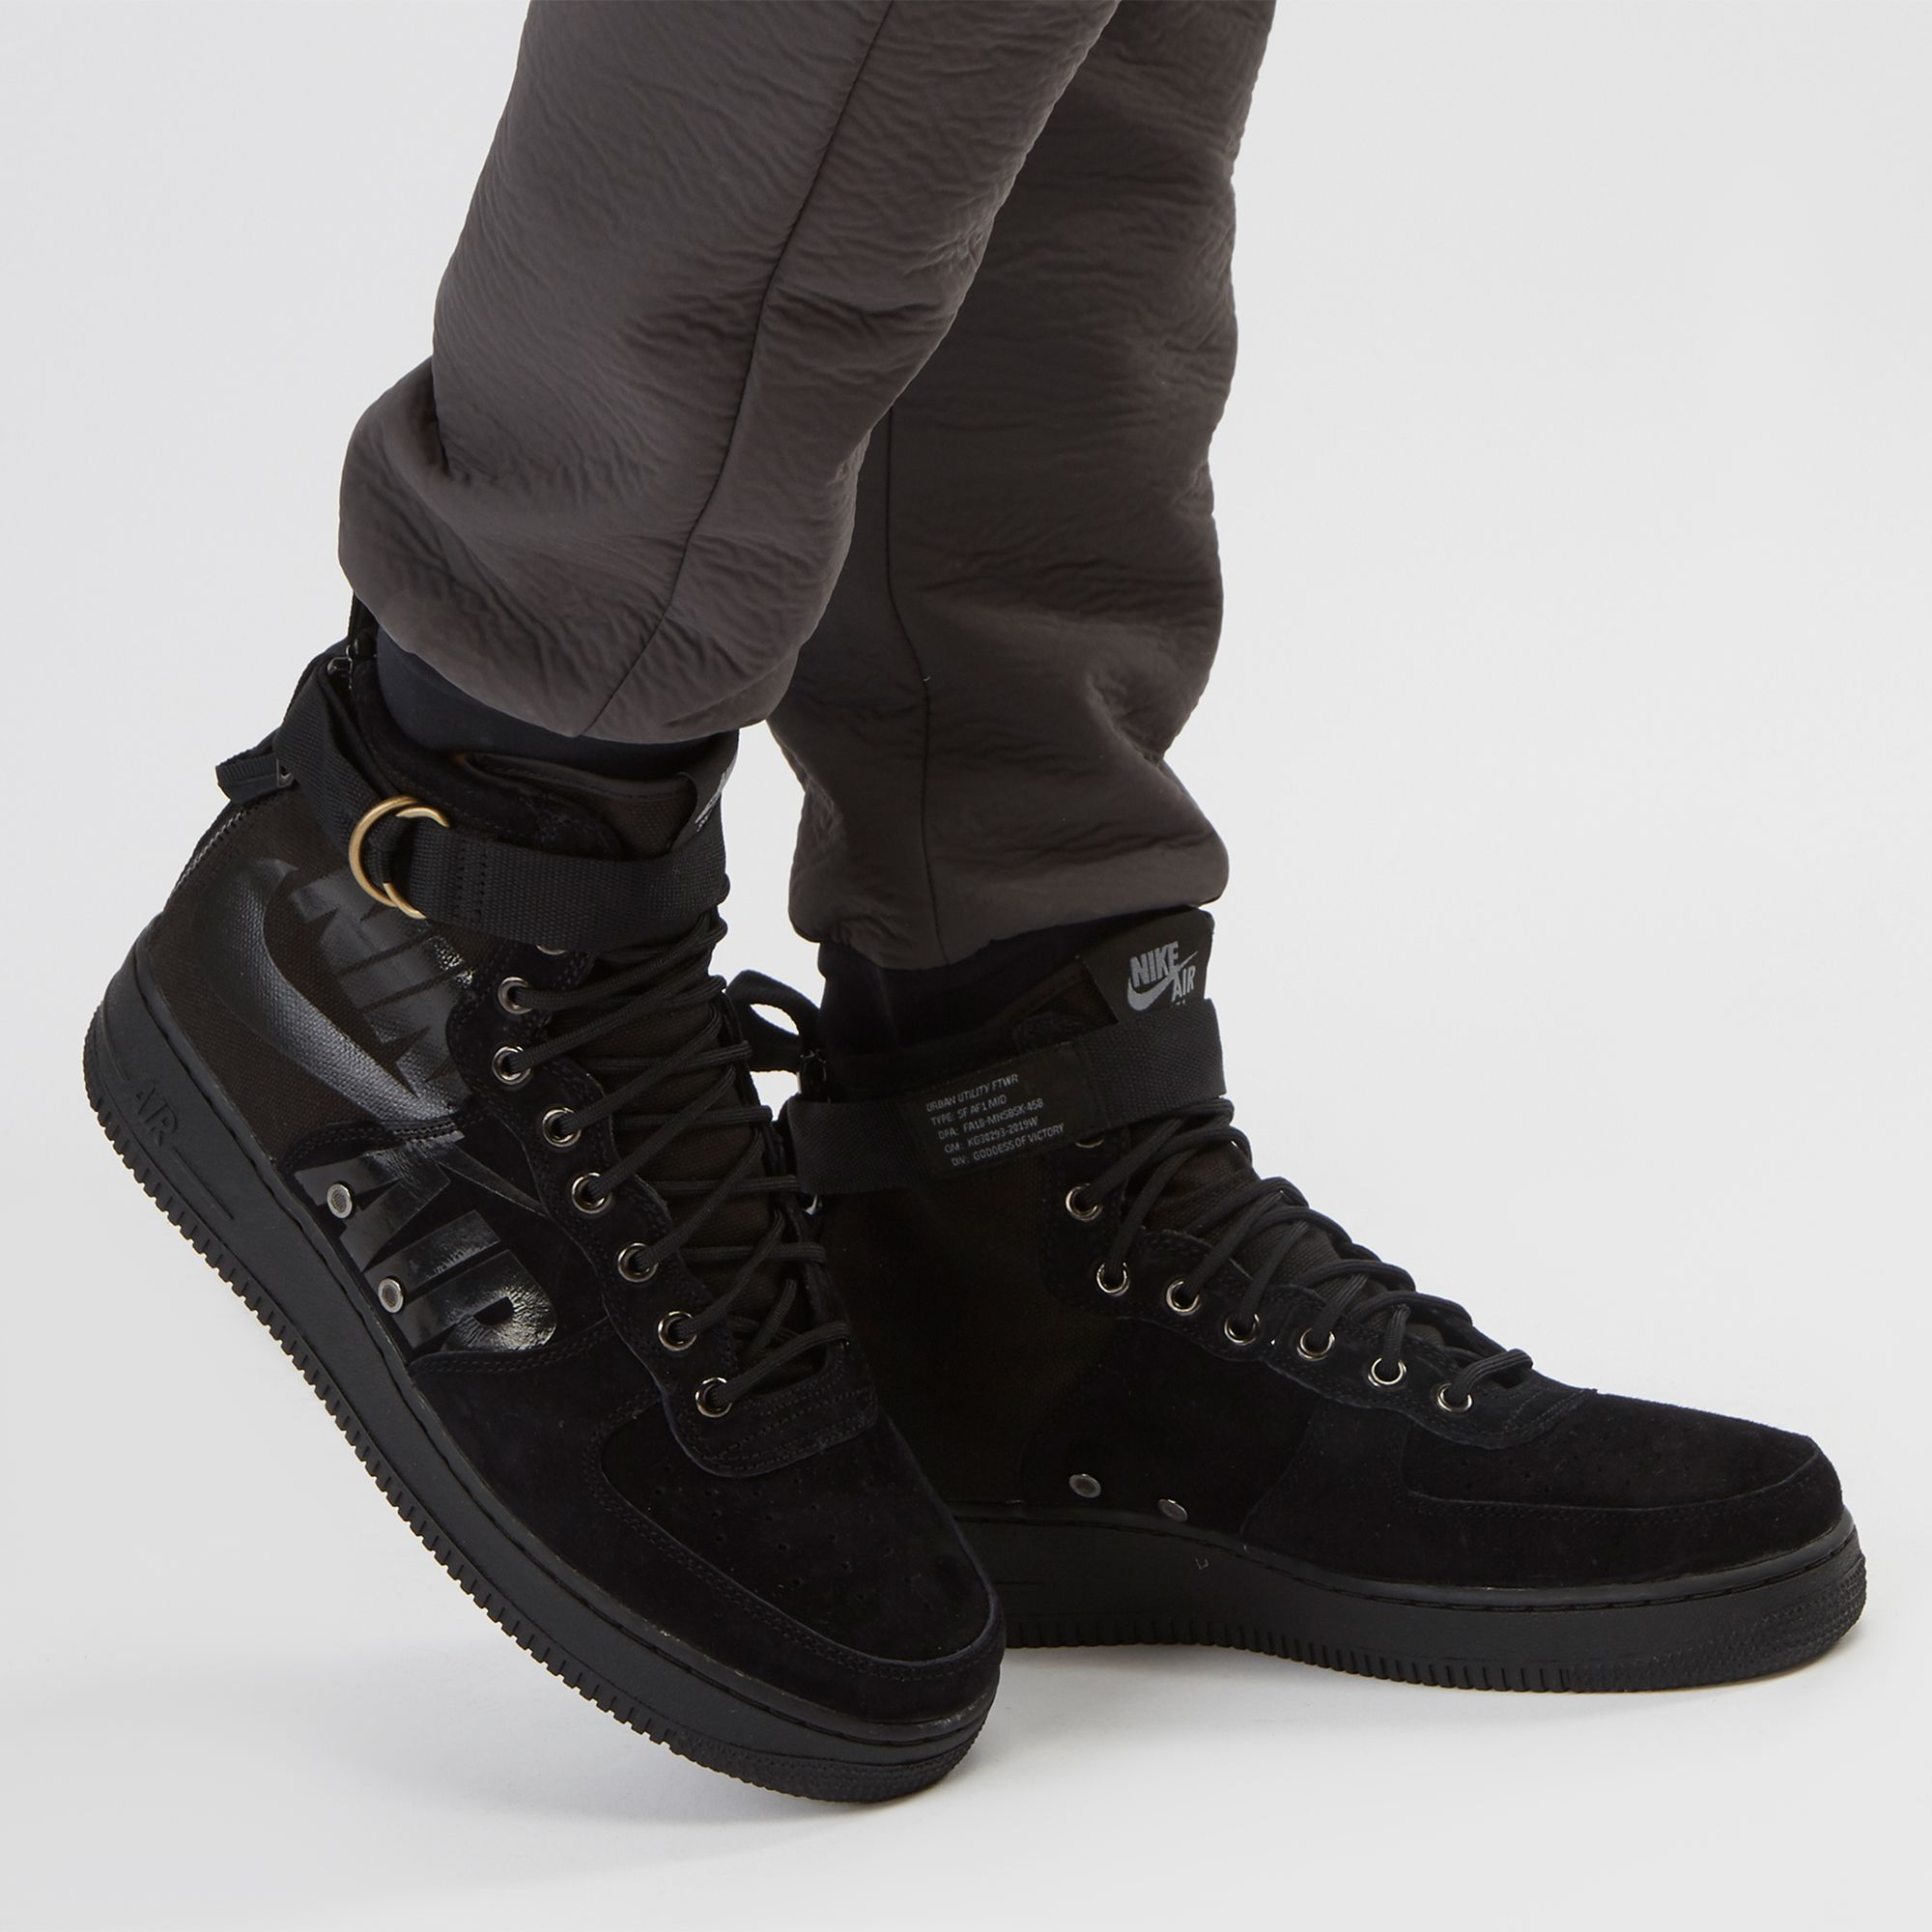 buy online 93efc c1aeb Nike Special Field Air Force 1 Mid Boot   Sneakers   Shoes   Men s Sale    Sale   SSS